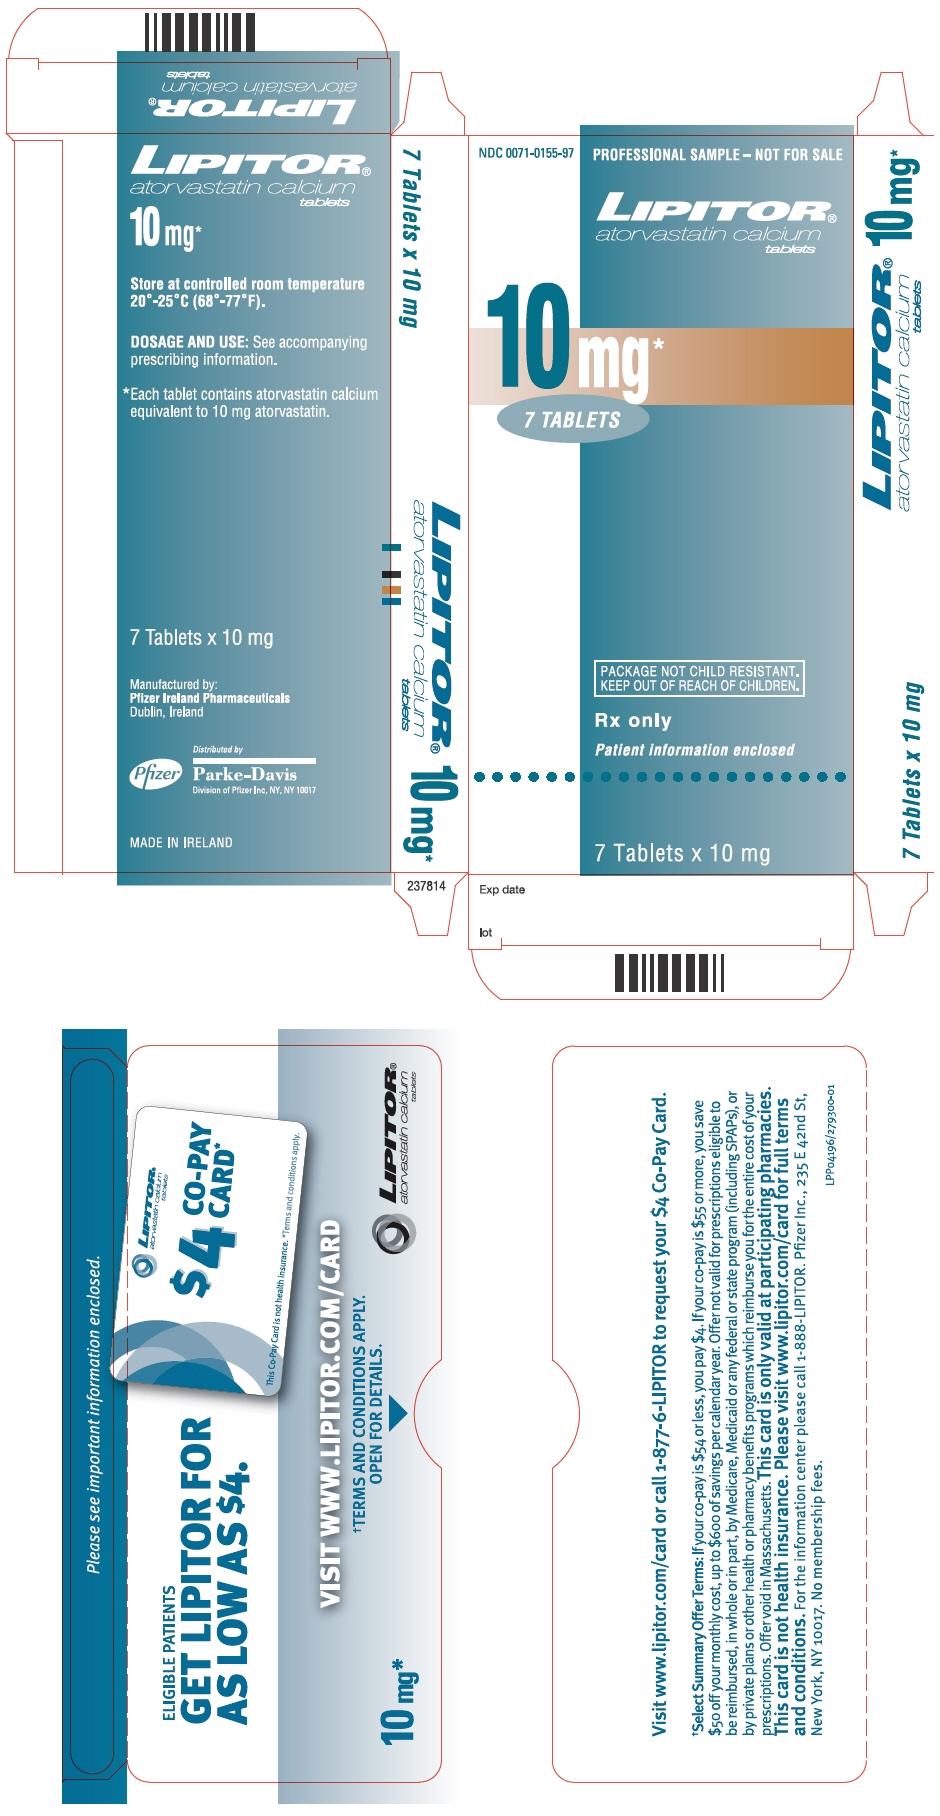 PRINCIPAL DISPLAY PANEL - 10 mg Tablet Packet Carton